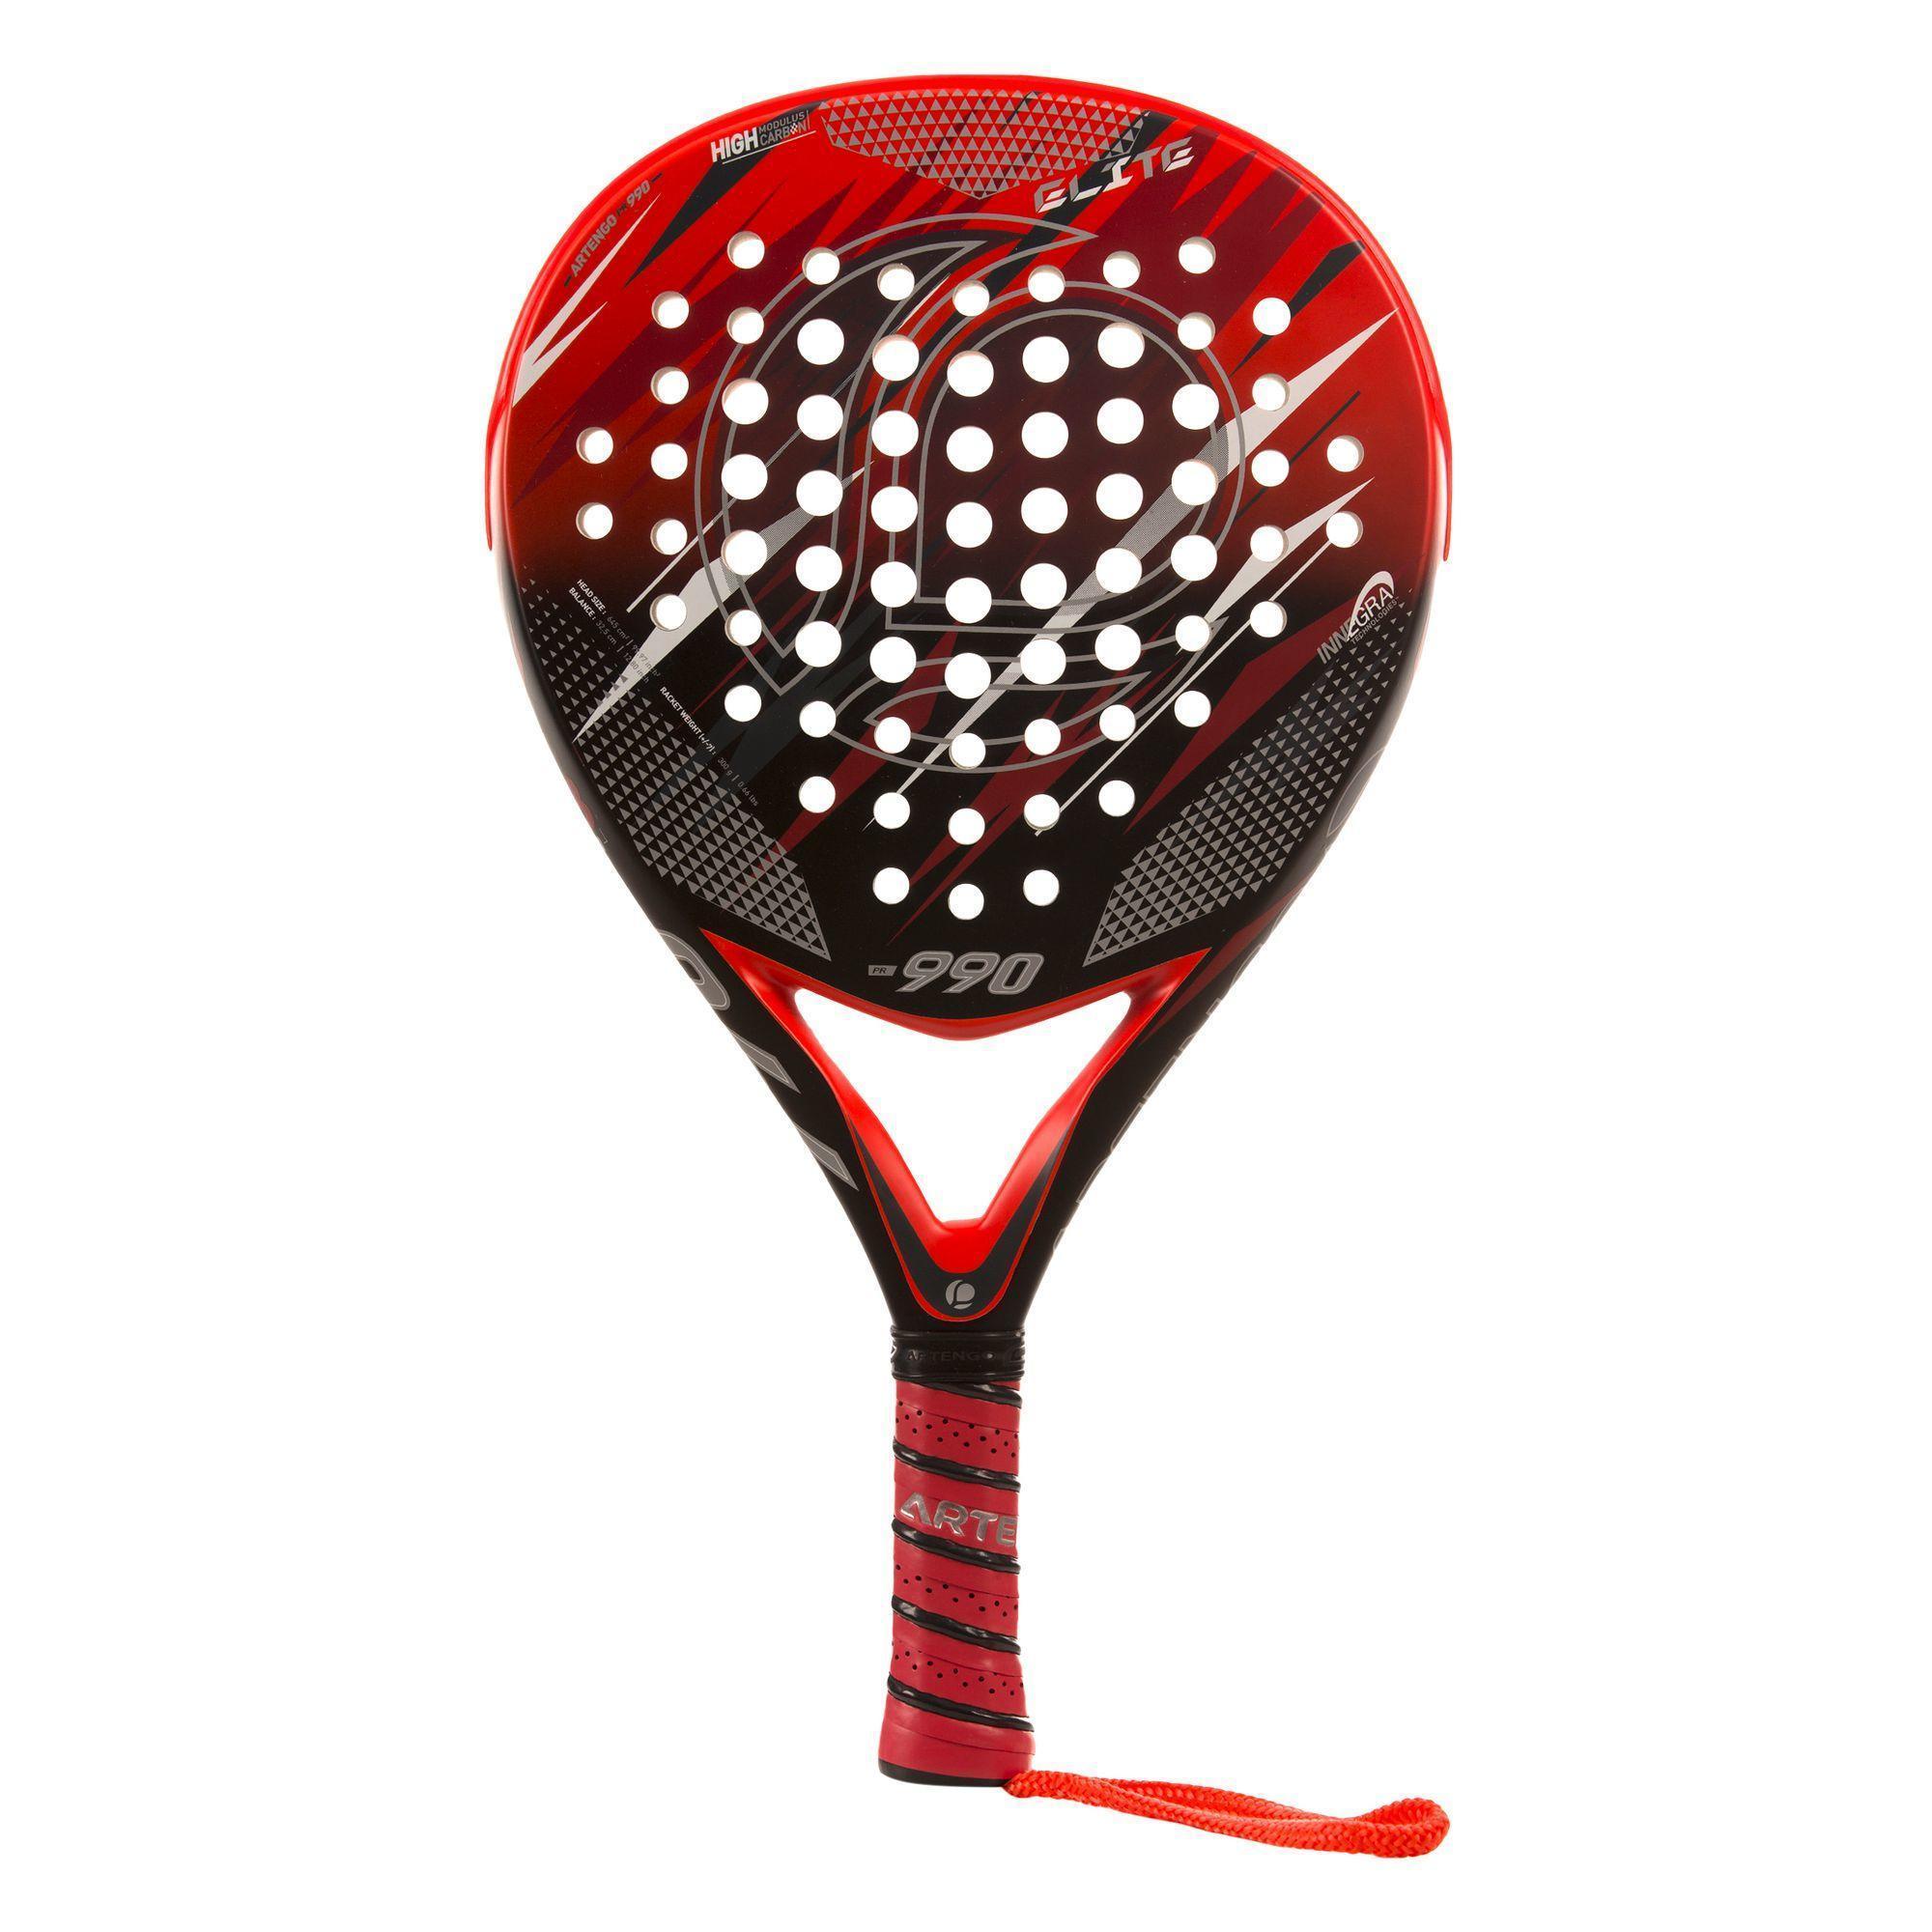 Adult's racket 68f7897f751c